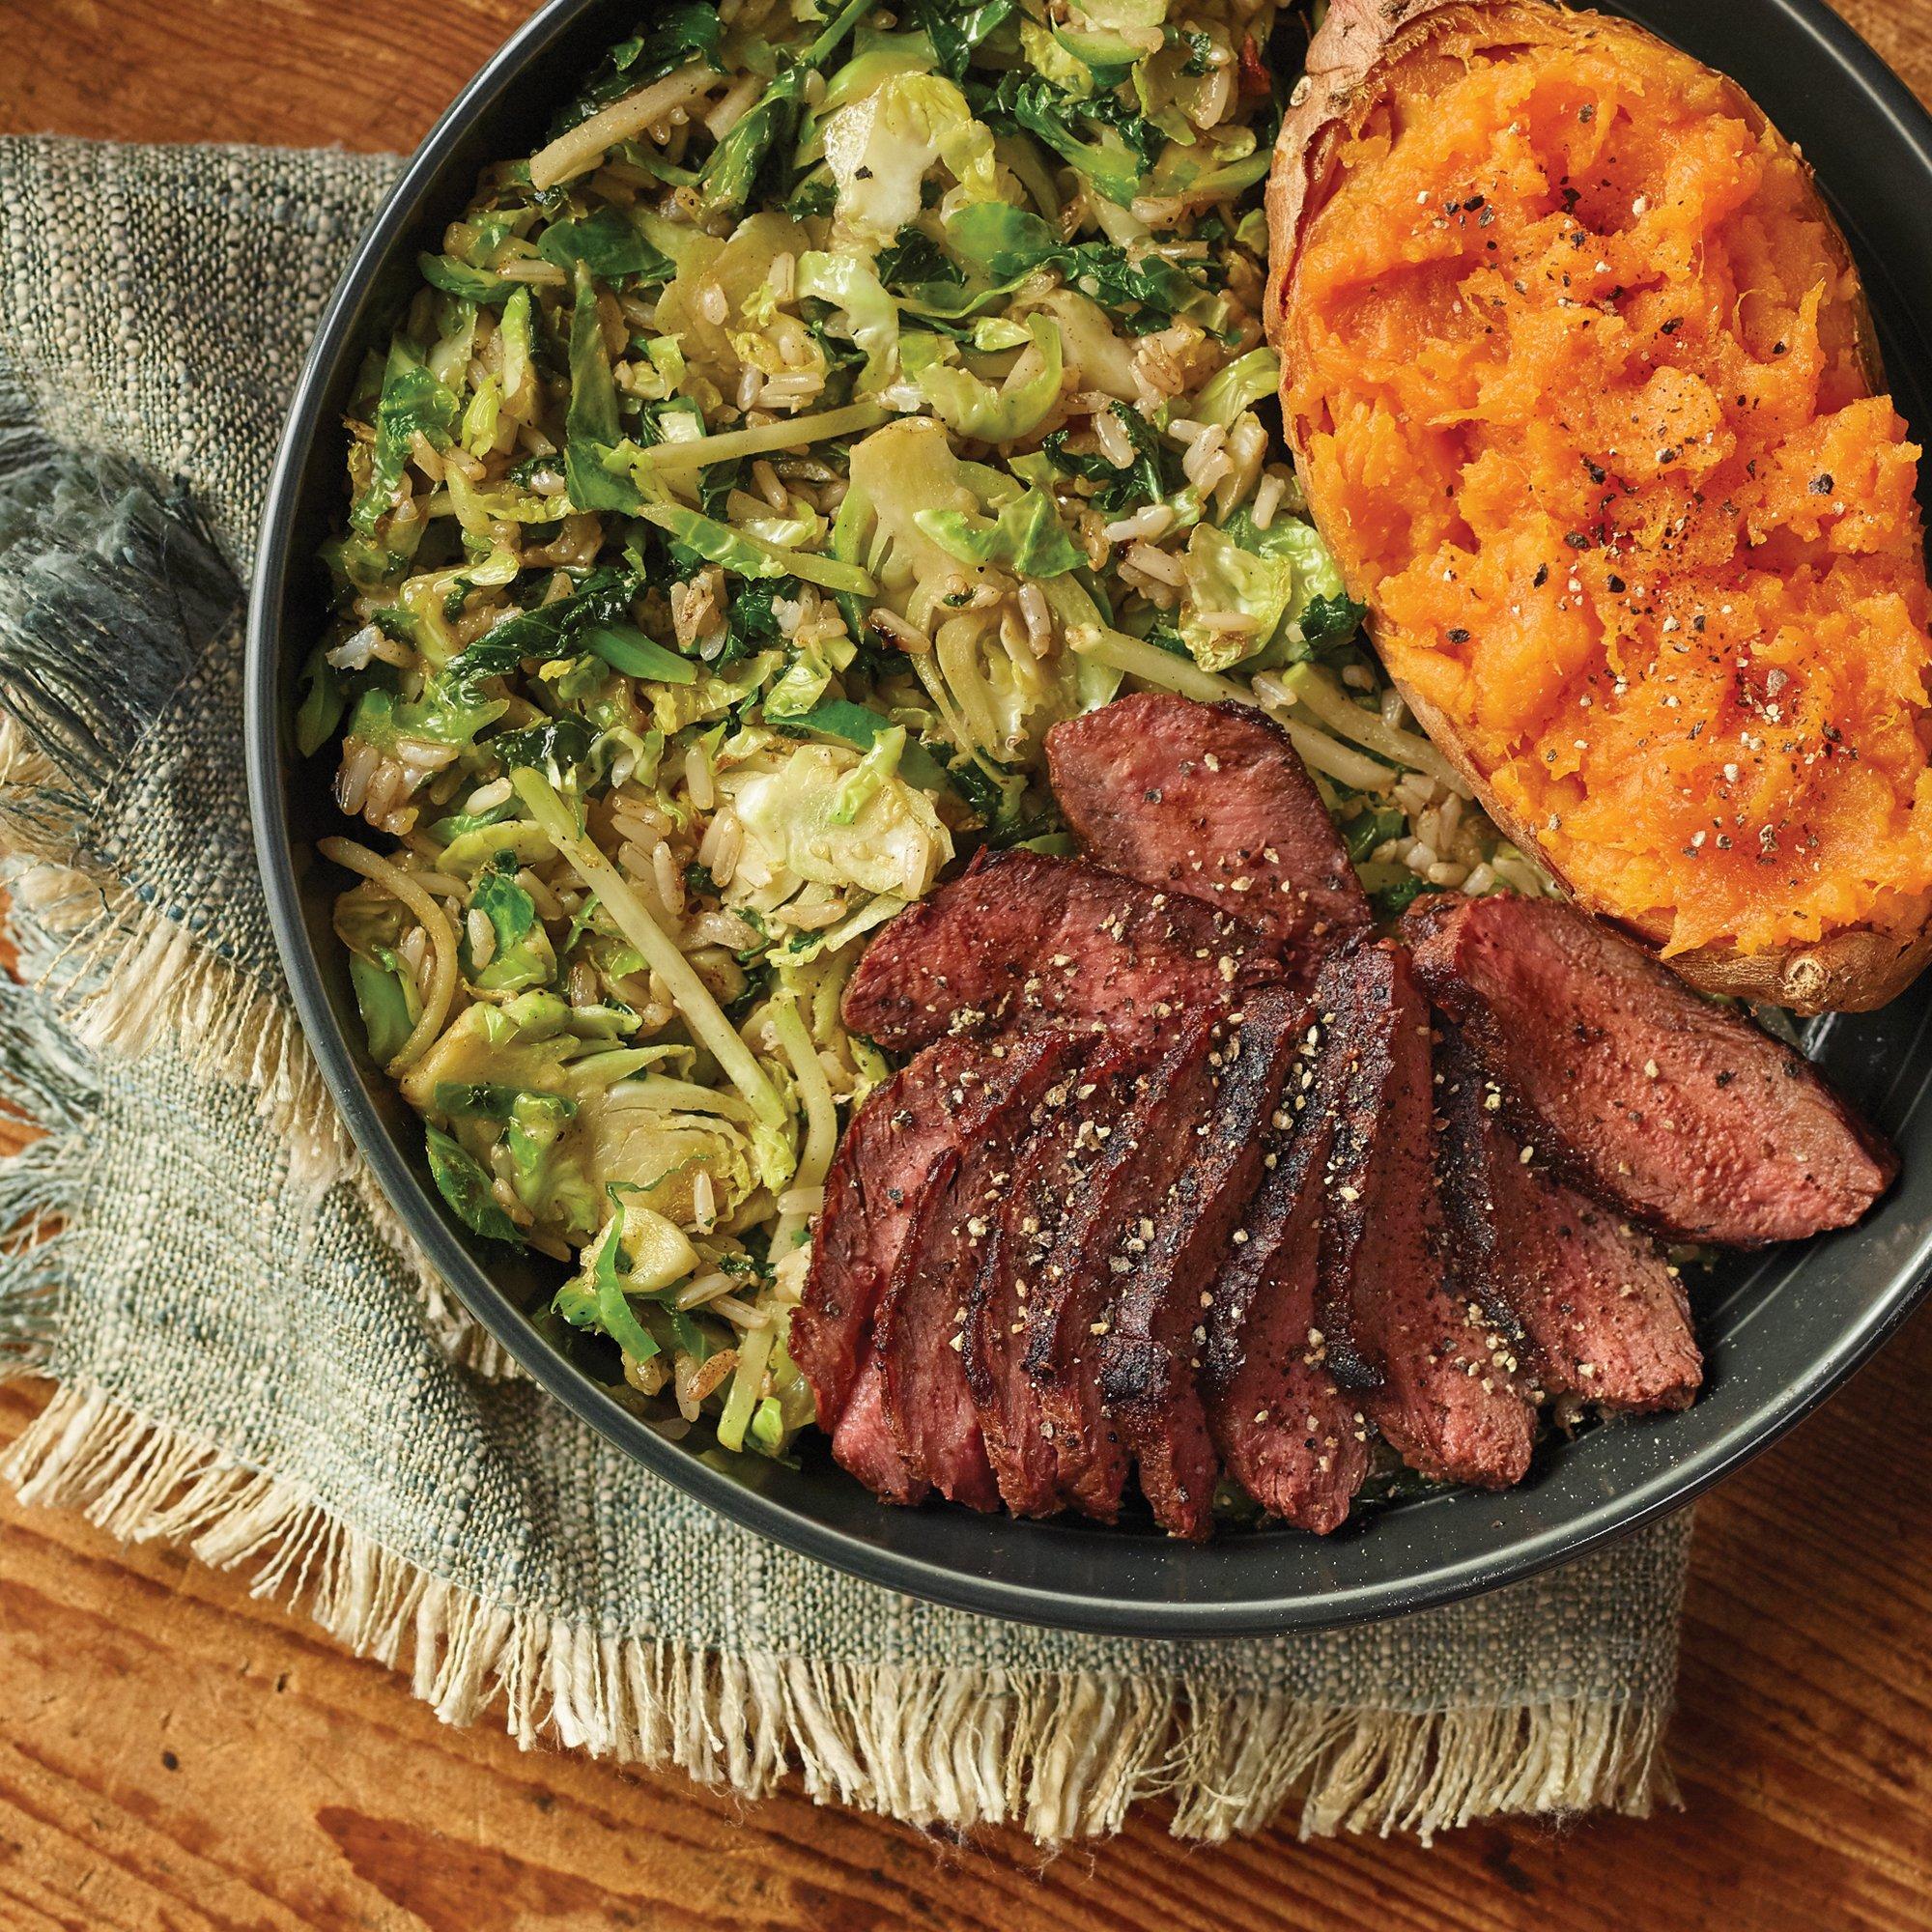 Smokehouse Brussels Nourish Bowl with Seared Flat Iron Steak